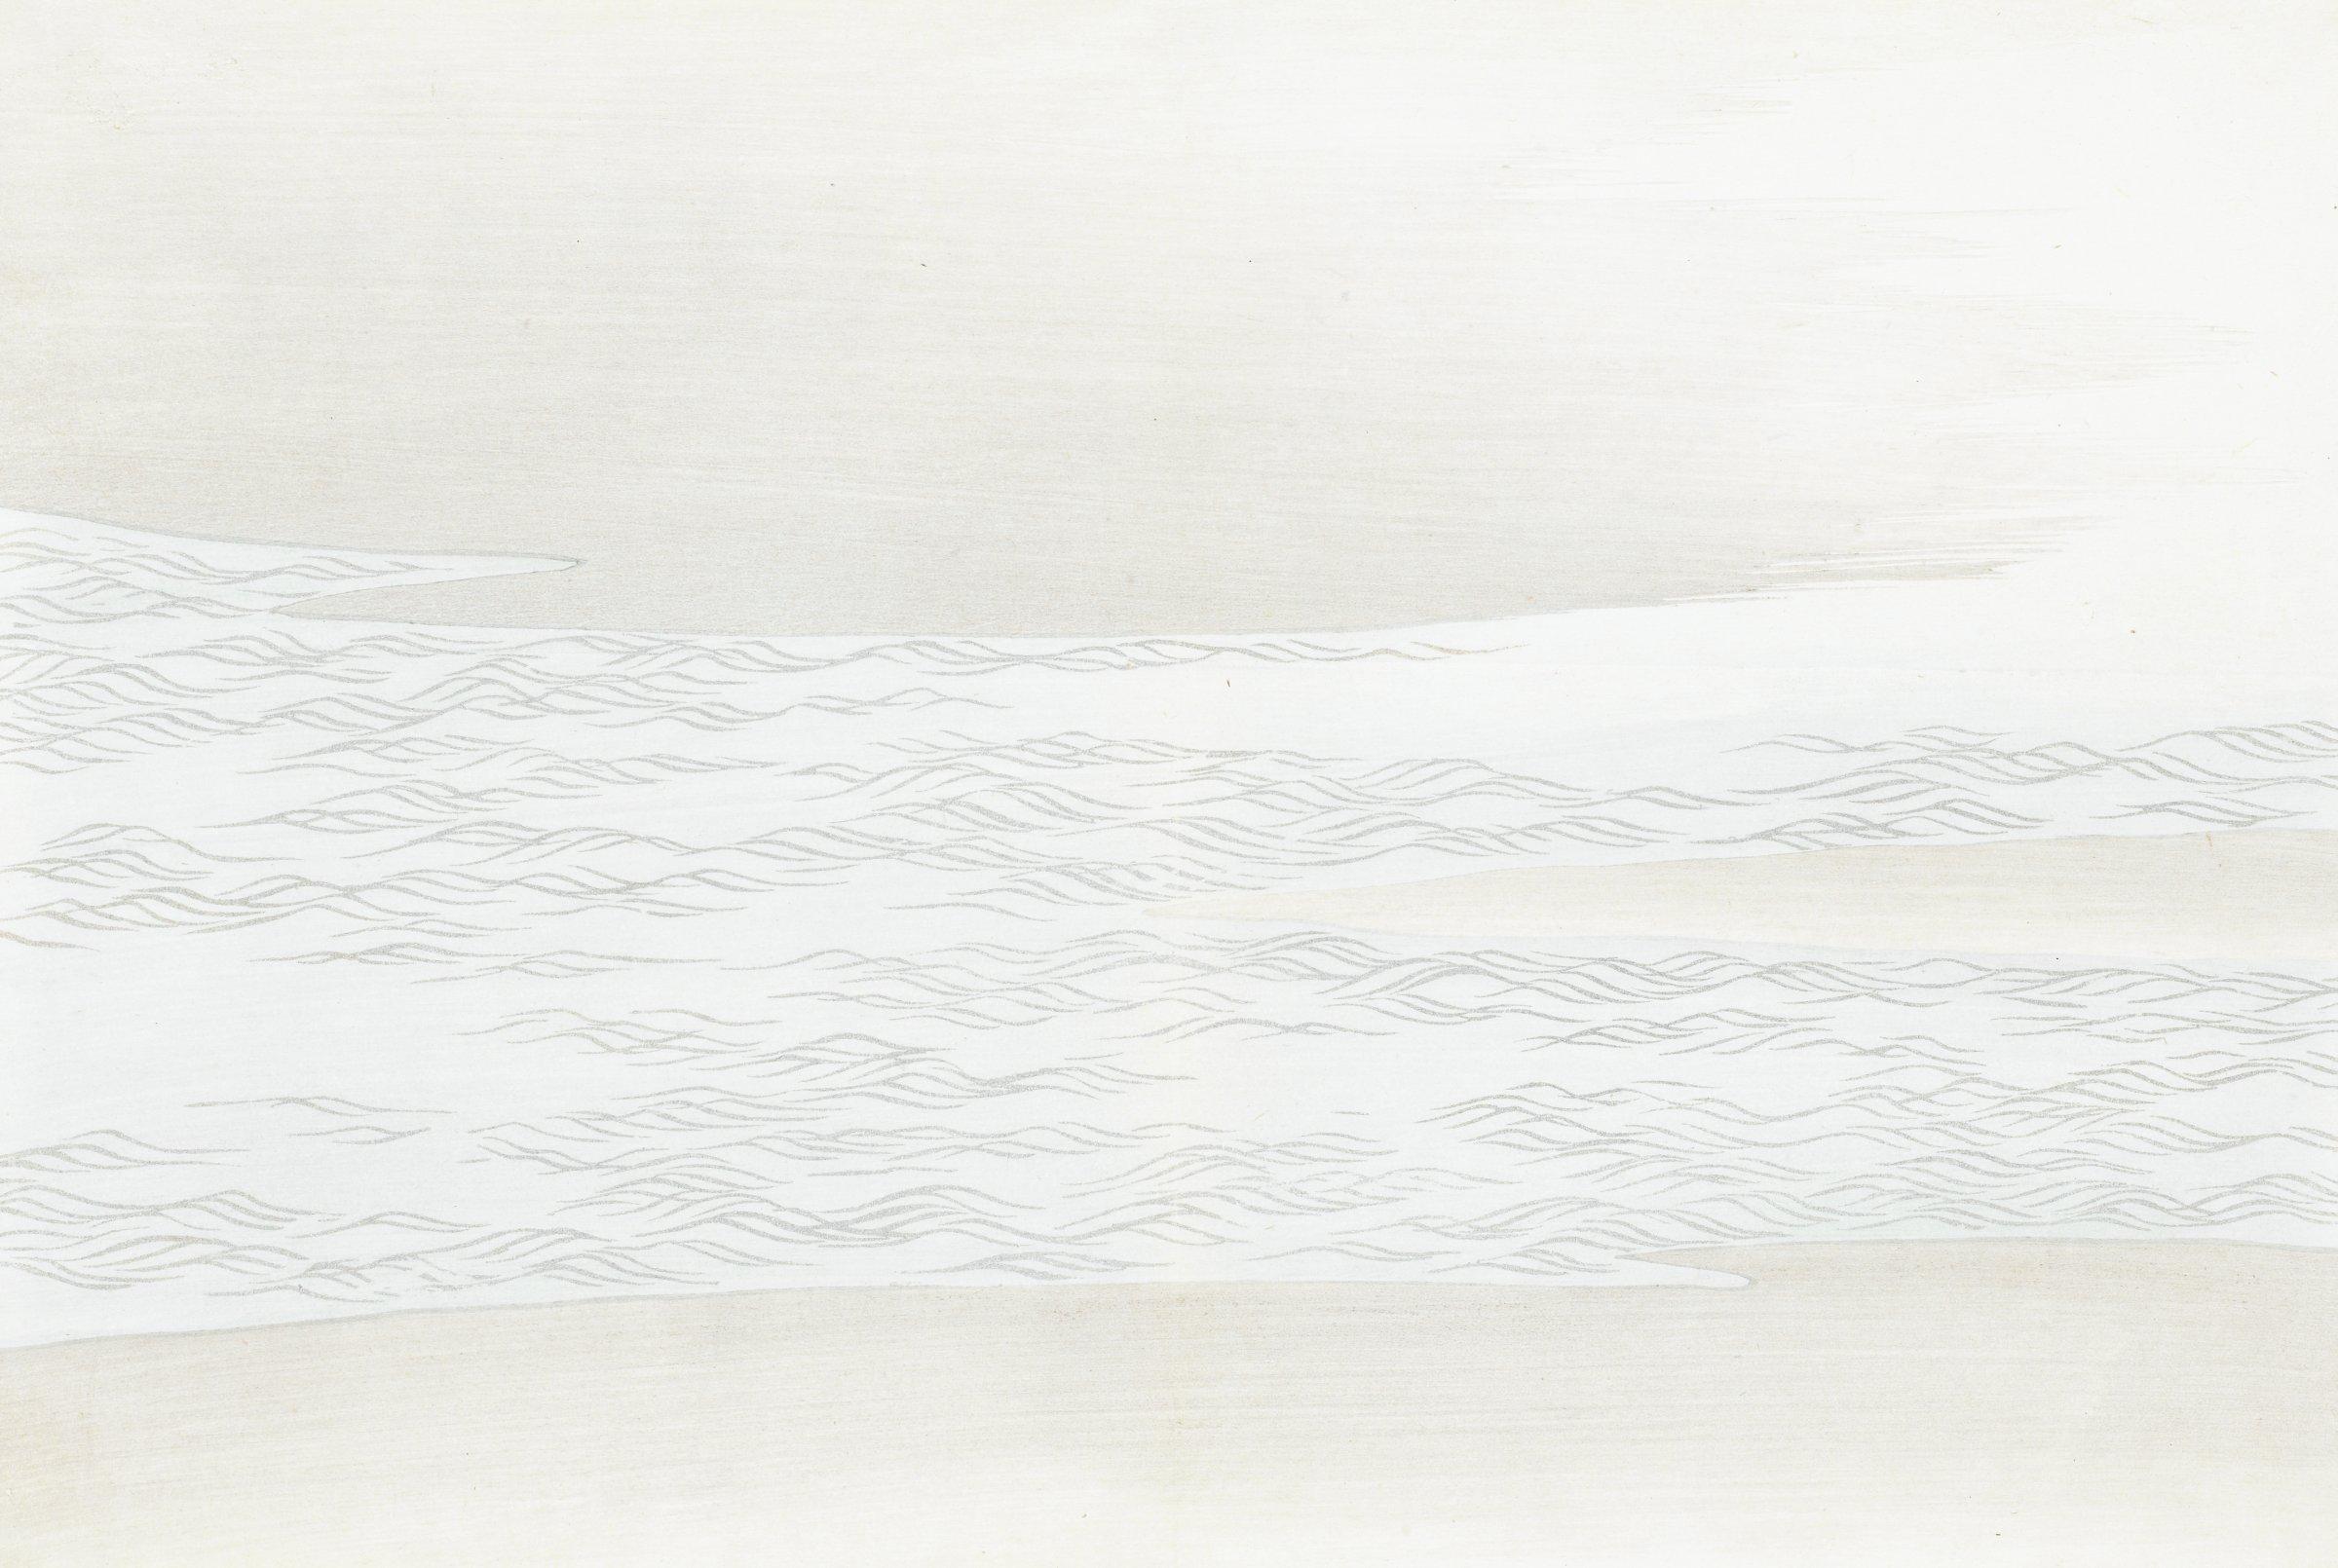 Konami (Small Waves), from Momoyogusa (A World of Things), Volume 2, Kamisaka Sekka, ink and color on paper